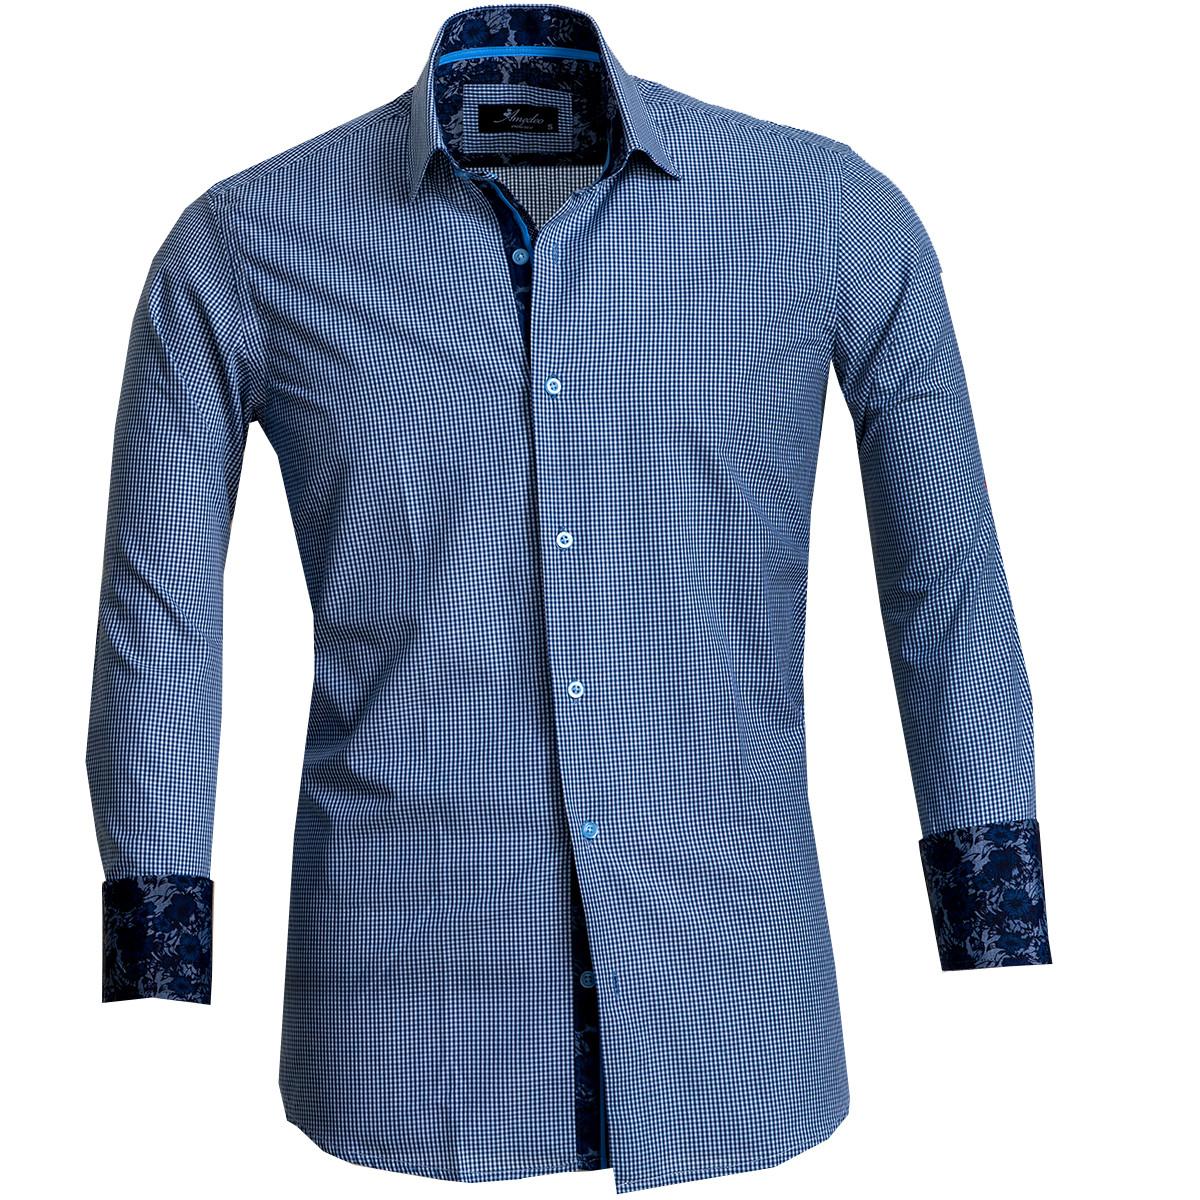 European Made & Designed Reversible Cuff Premium French Cuff Dress Shirt - blue check